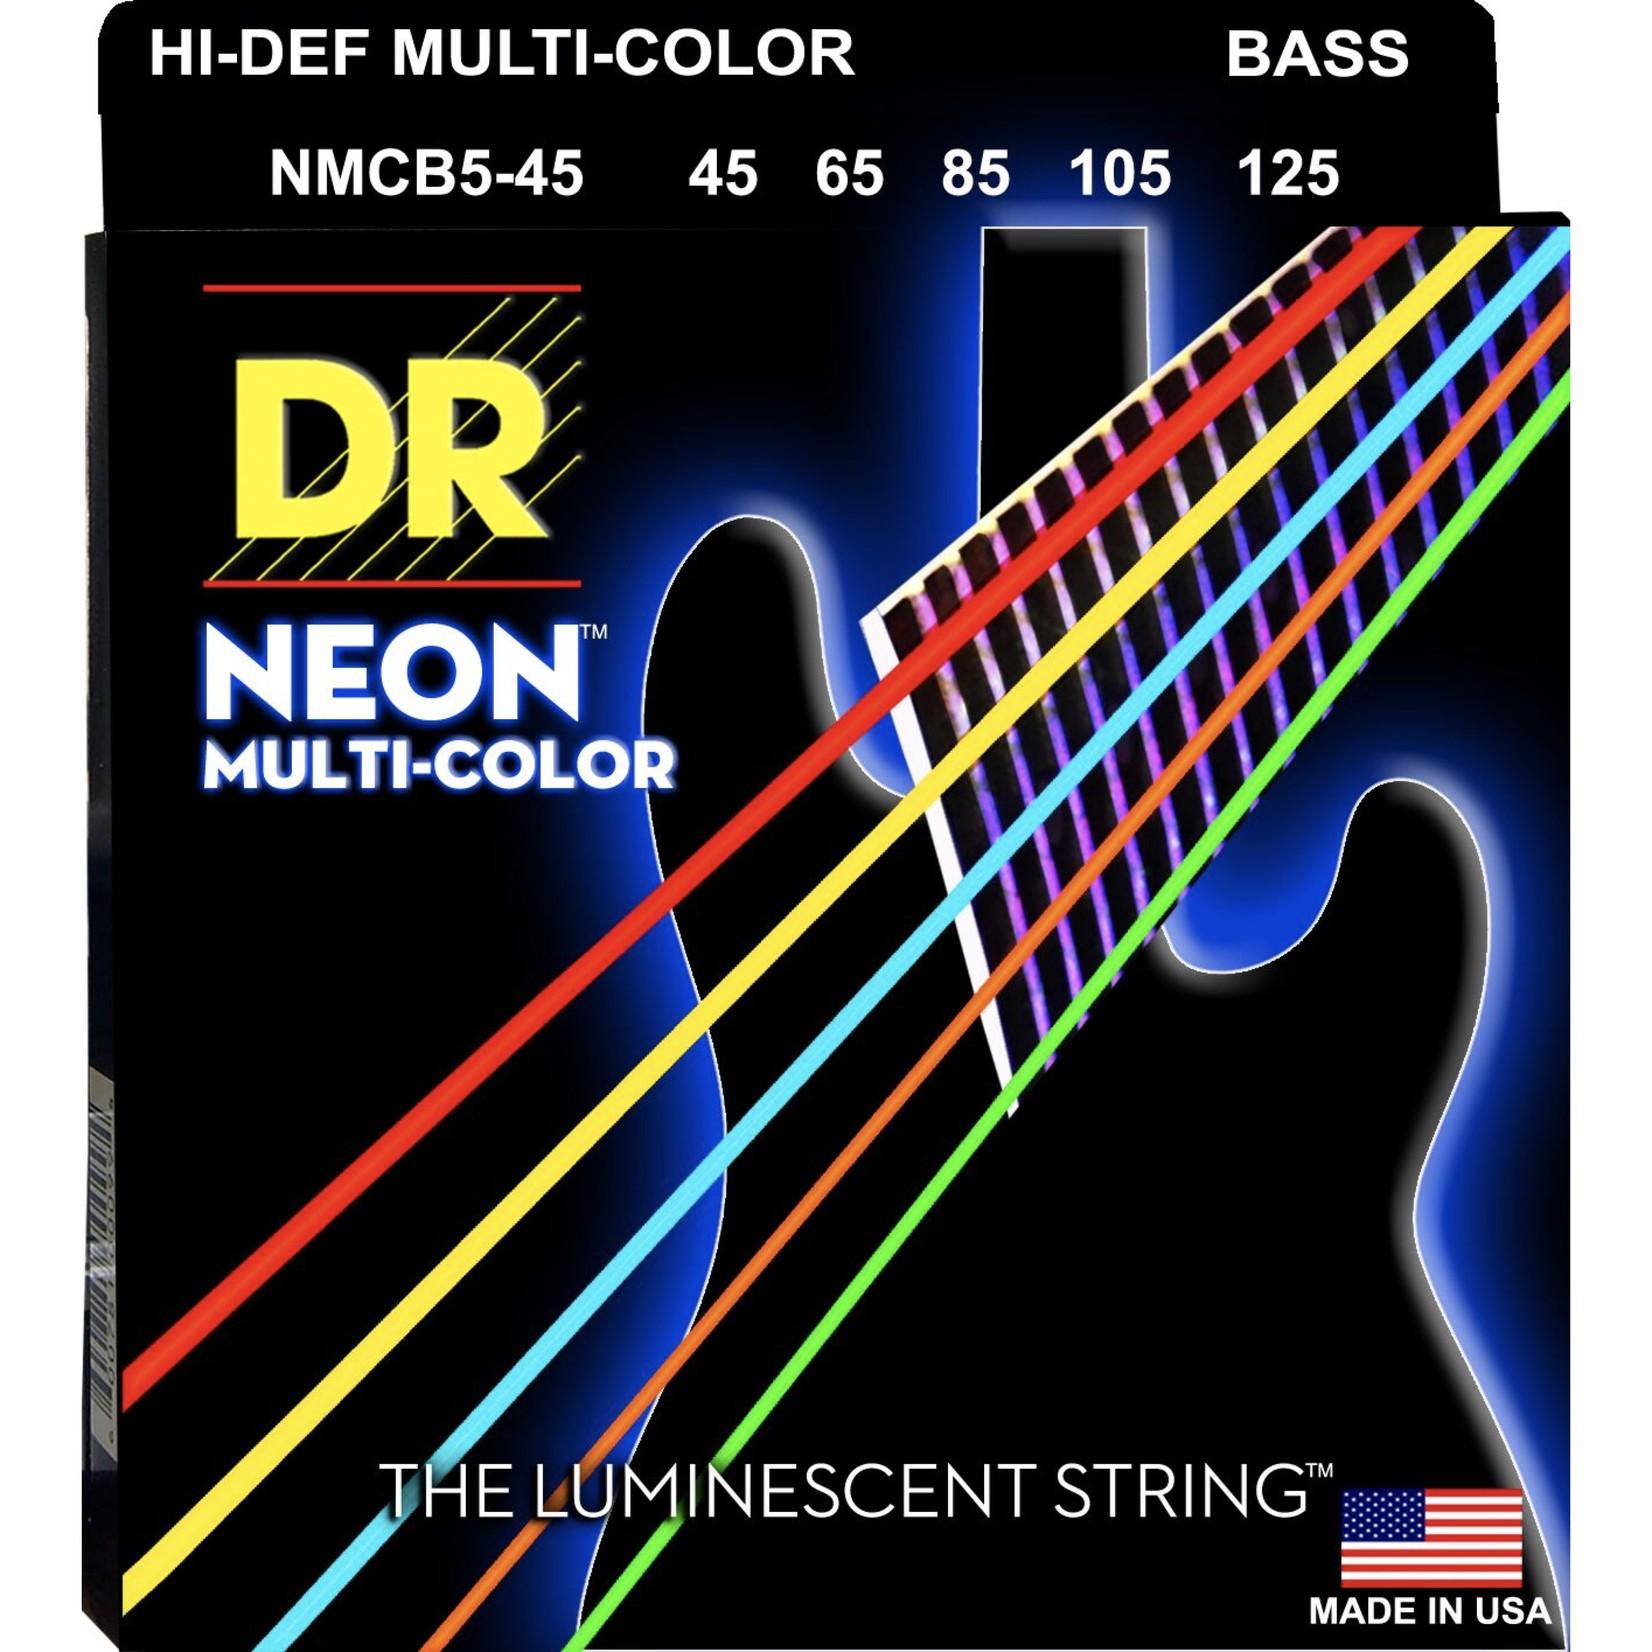 DR Strings DR Strings HI-DEF NEONª - Multi-Color Colored Bass Strings: 5-String Set, Medium 45-125, NMCB5-45